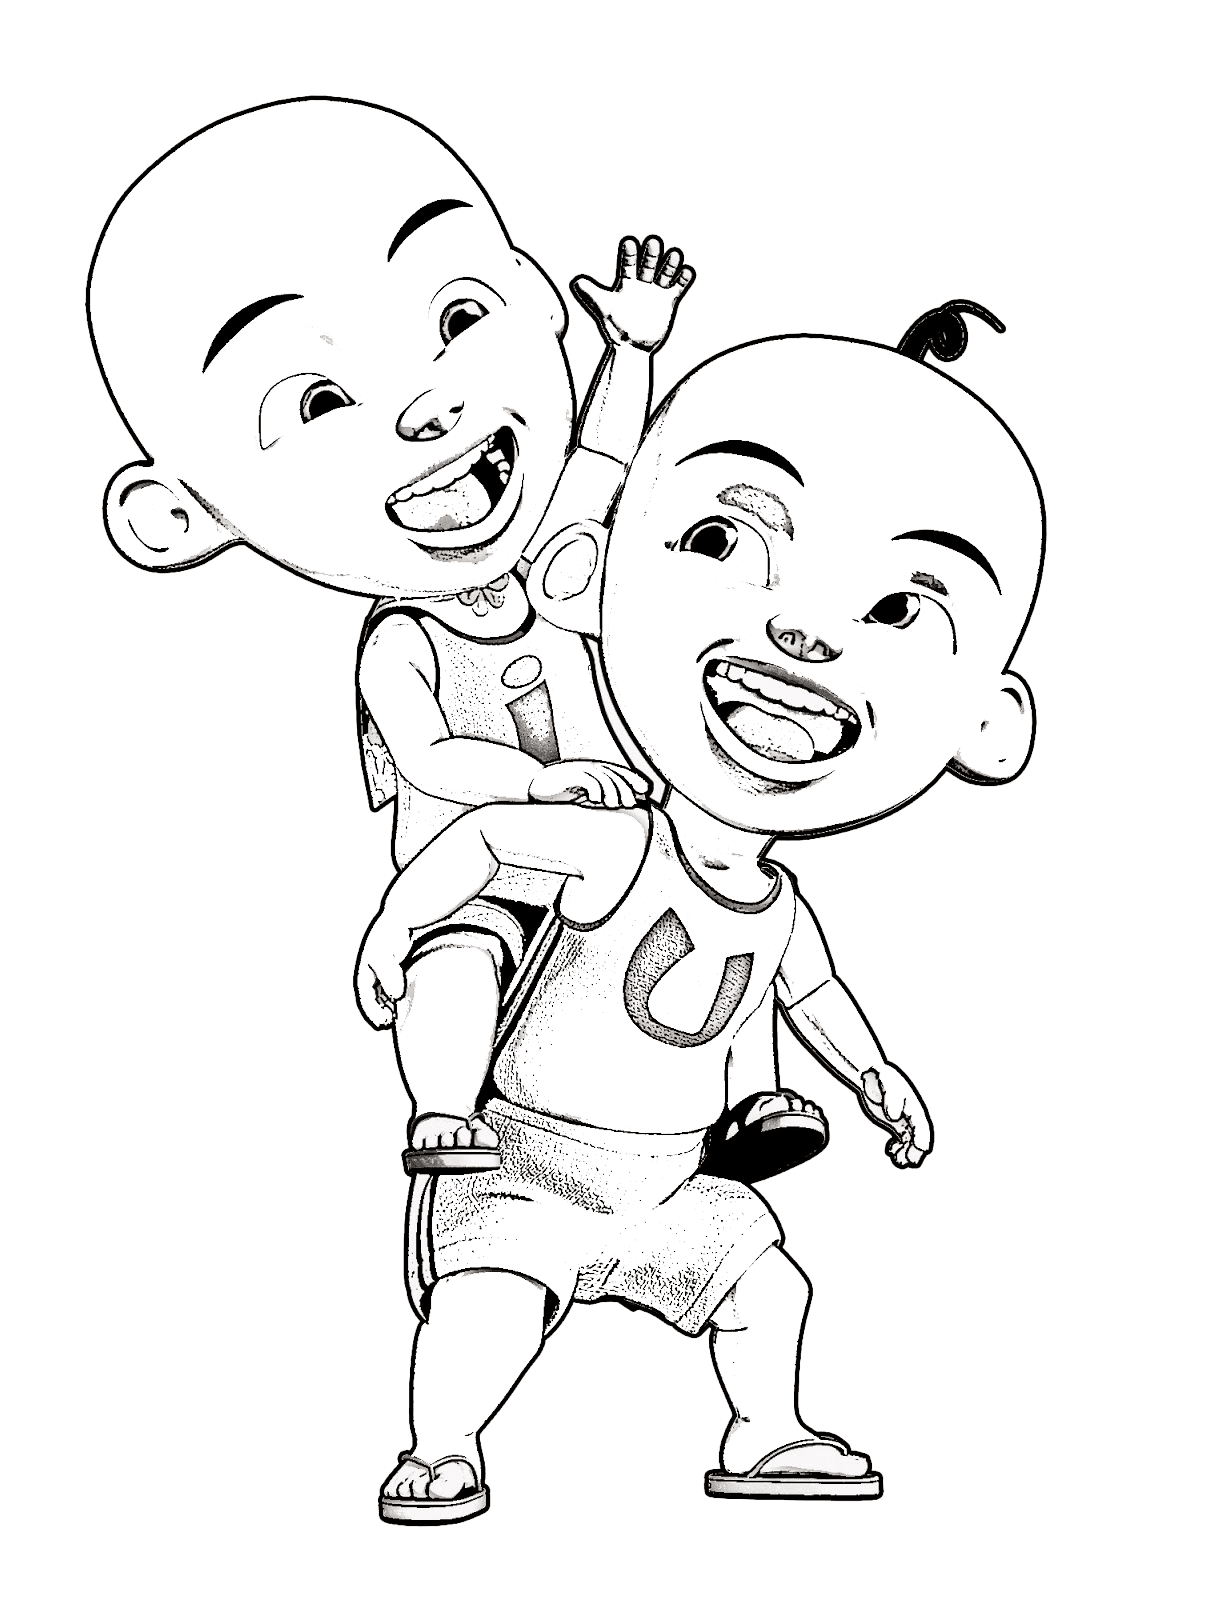 Gambar Buku Kartun Hitam Putih : gambar, kartun, hitam, putih, Gambar, Kartun, Hitam, Putih, Mewarnai,, Kartun,, Coloring